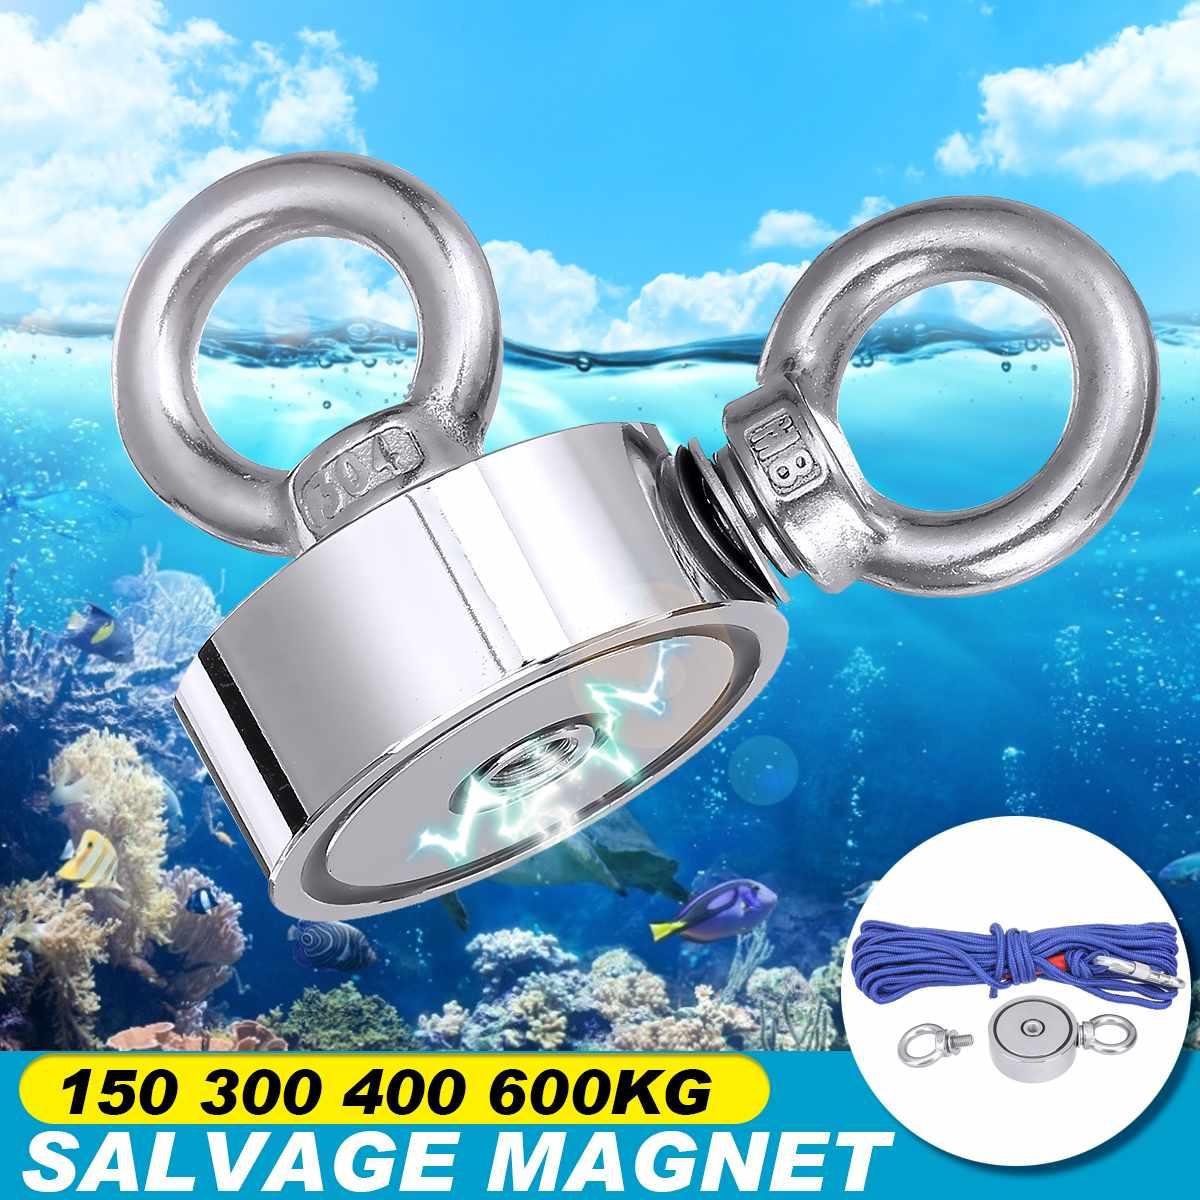 Imán de neodimio de 600Kg, doble anillo de elevación, gancho magnético de búsqueda, gran potencia, imán de pesca de salvamento de aguas profundas + cuerda de 20m